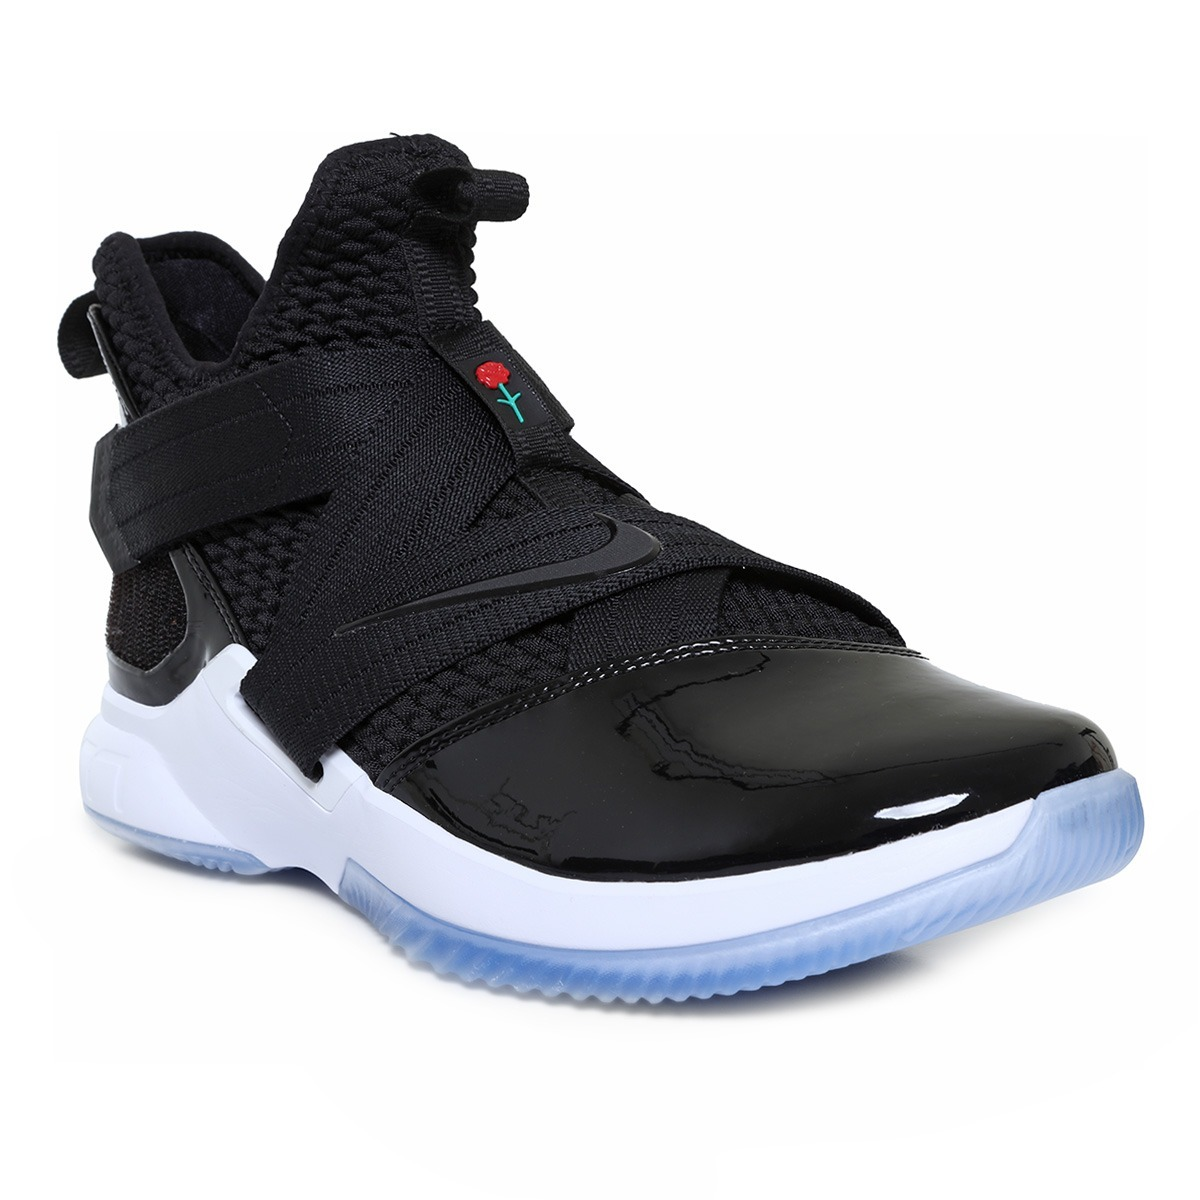 newest 77418 28326 Tenis Nike Lebron Soldier Xii Negro Rose Basketball Original